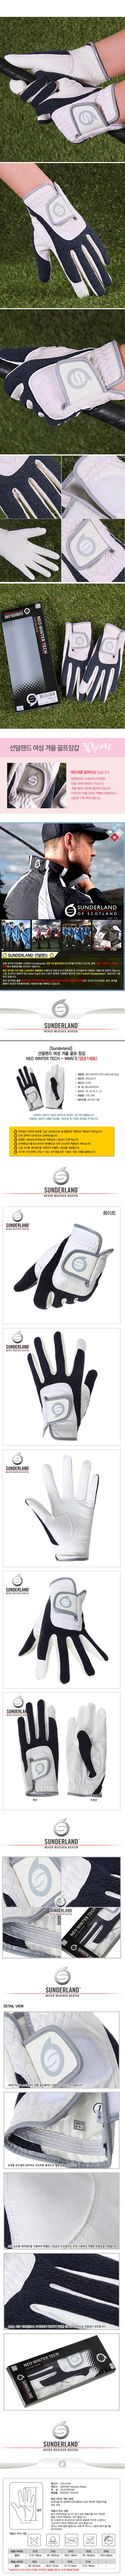 sunderland_neo_winter_tech_wm_glove.jpg